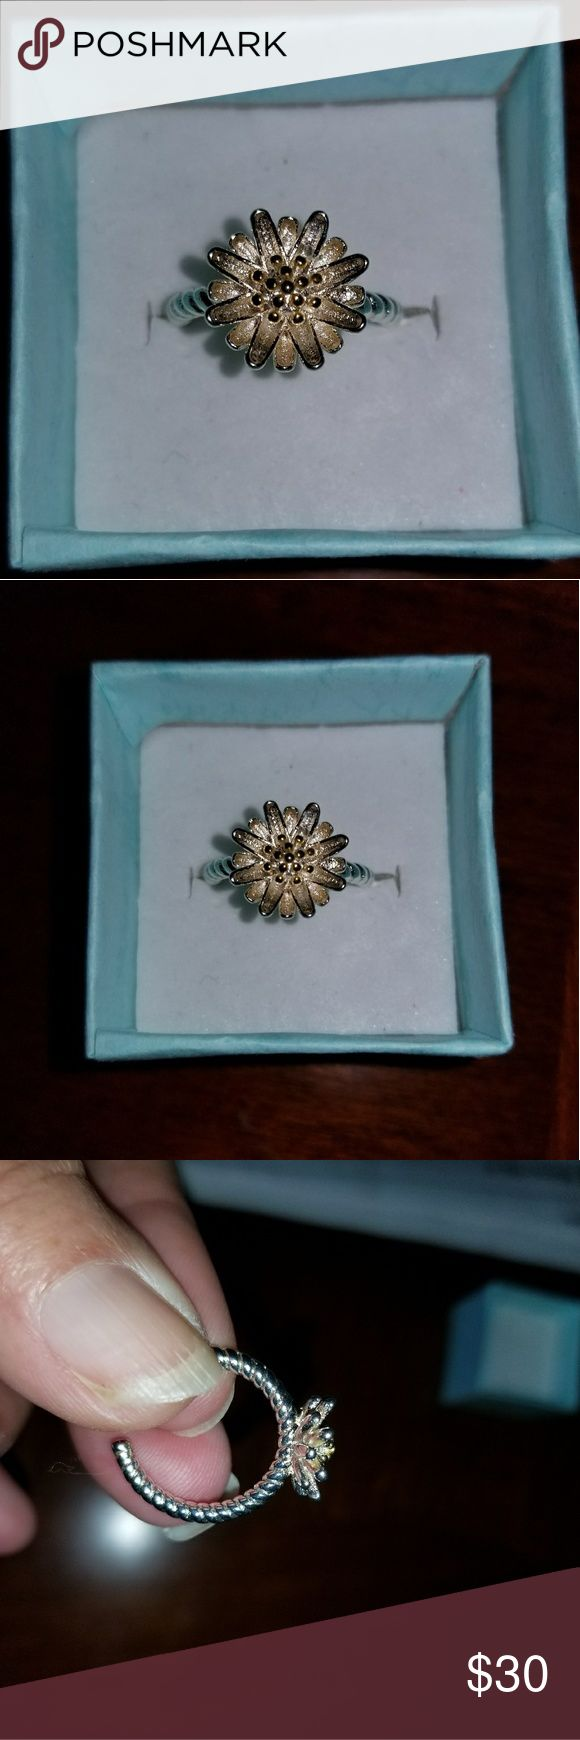 Pandora daisy ring Pandora daisy ring, Sterling silver and adjustable. Very dainty ring Pandora Jewelry Rings